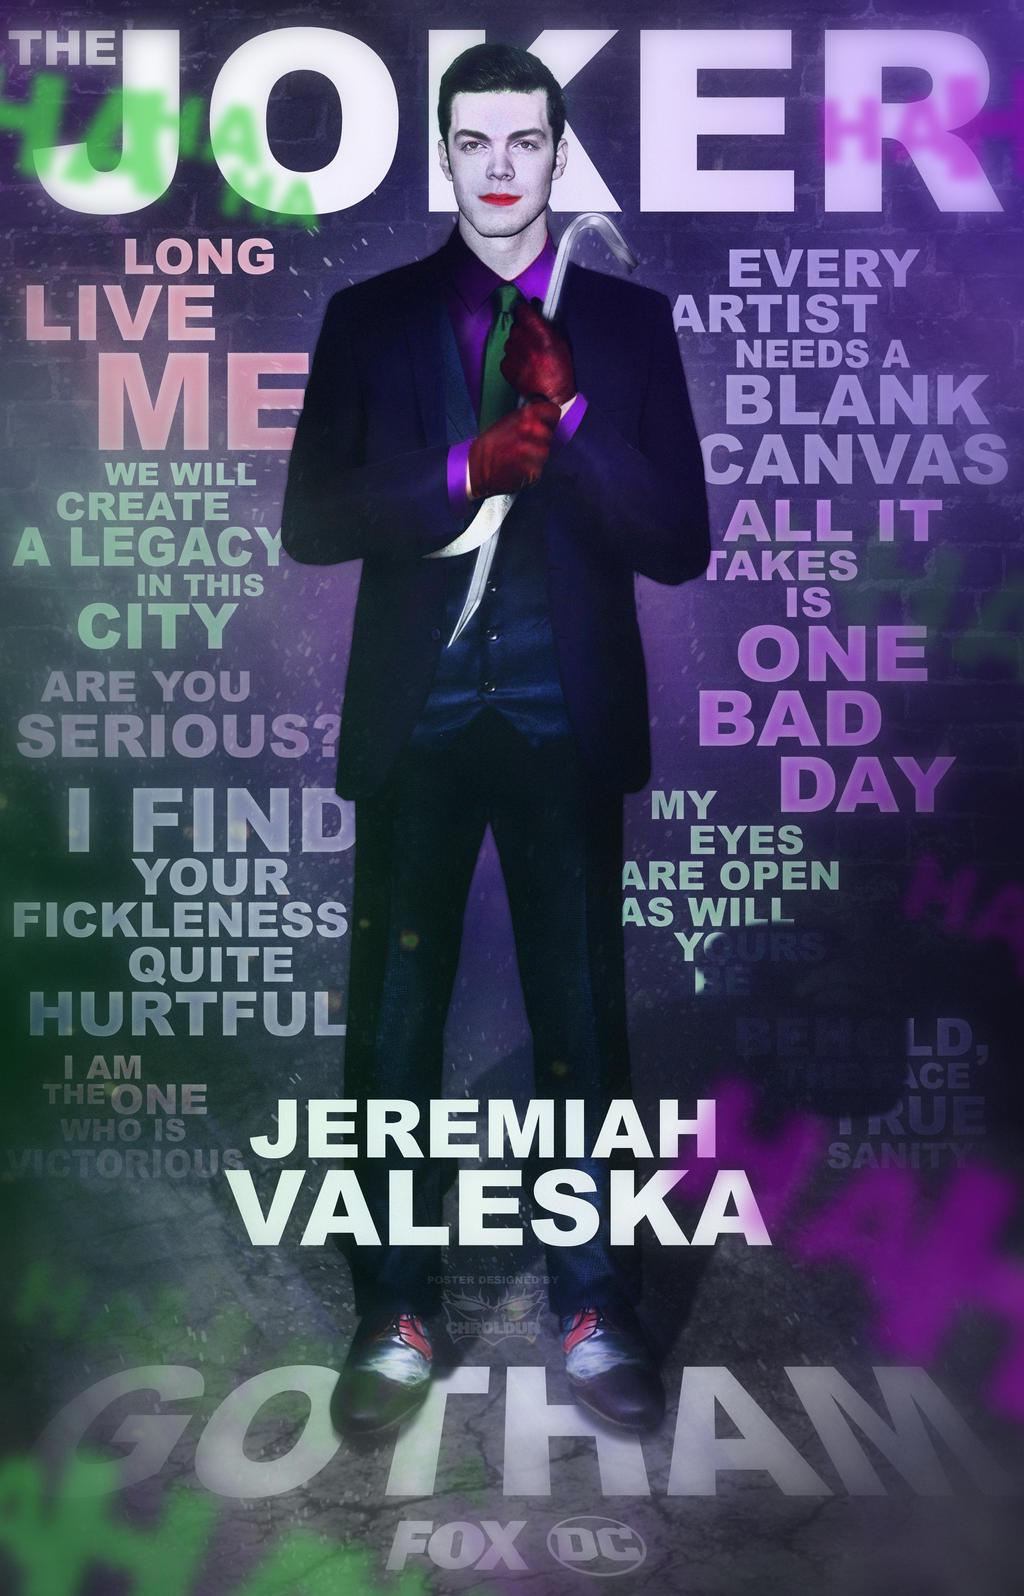 Jeremiah Valeska The Joker By Digestingbat On Deviantart .(arthur penn to jeremiah valeska)note arthur penn/ the ventriloquist, basil/ clayface, bridget edward nygma/the riddler, ivy pepper/ poison ivy, jervis tetch/mad hatter, jeremiah valeska/ the. jeremiah valeska the joker by